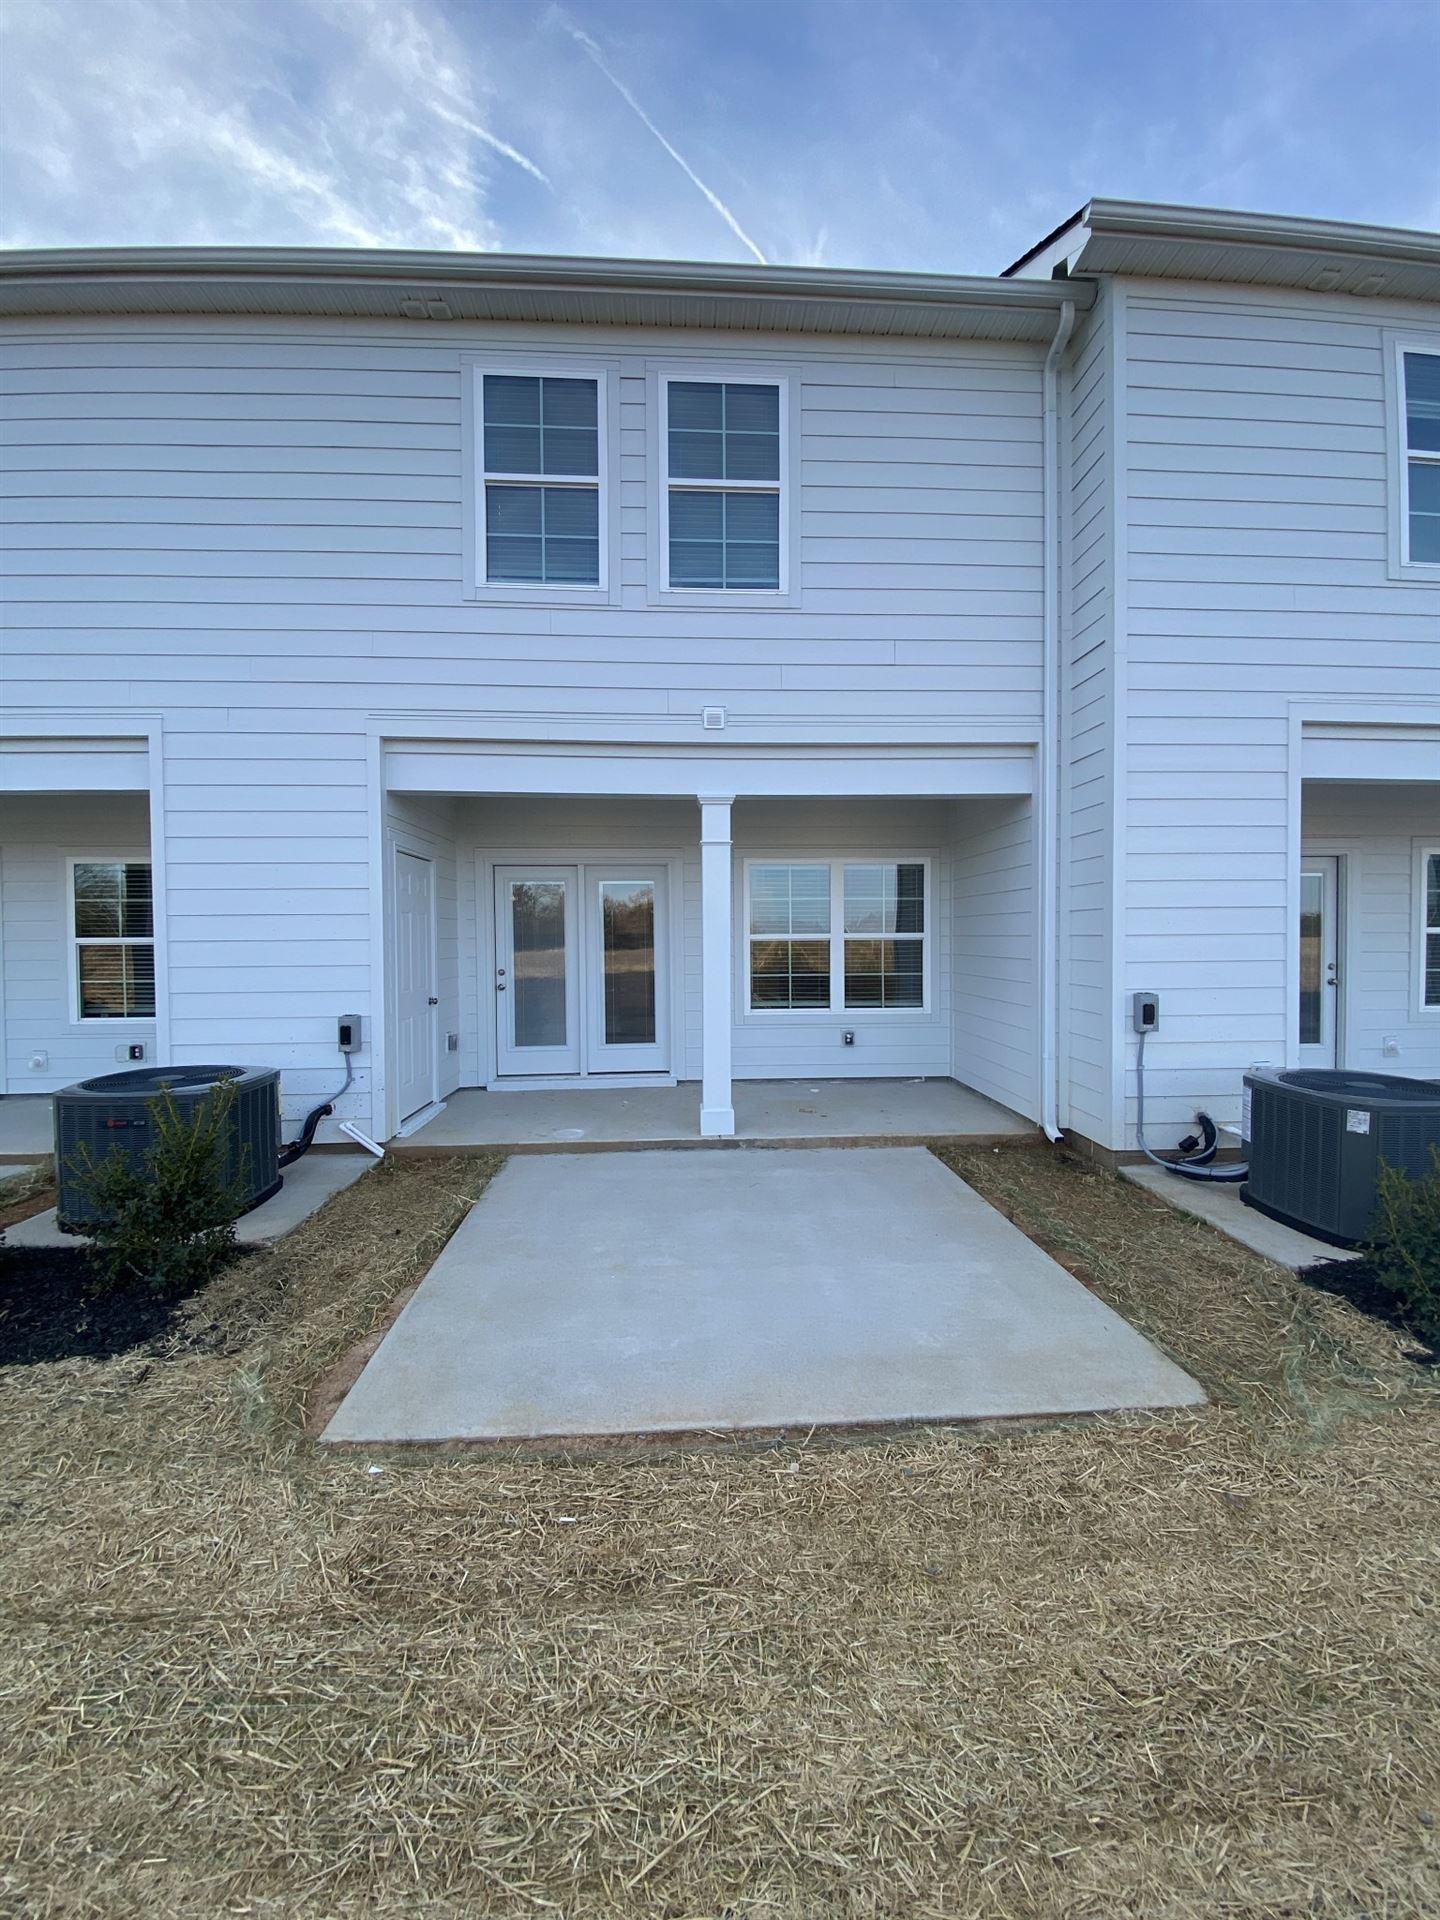 Photo of 4344 Doral Dr, Murfreesboro, TN 37127 (MLS # 2243263)